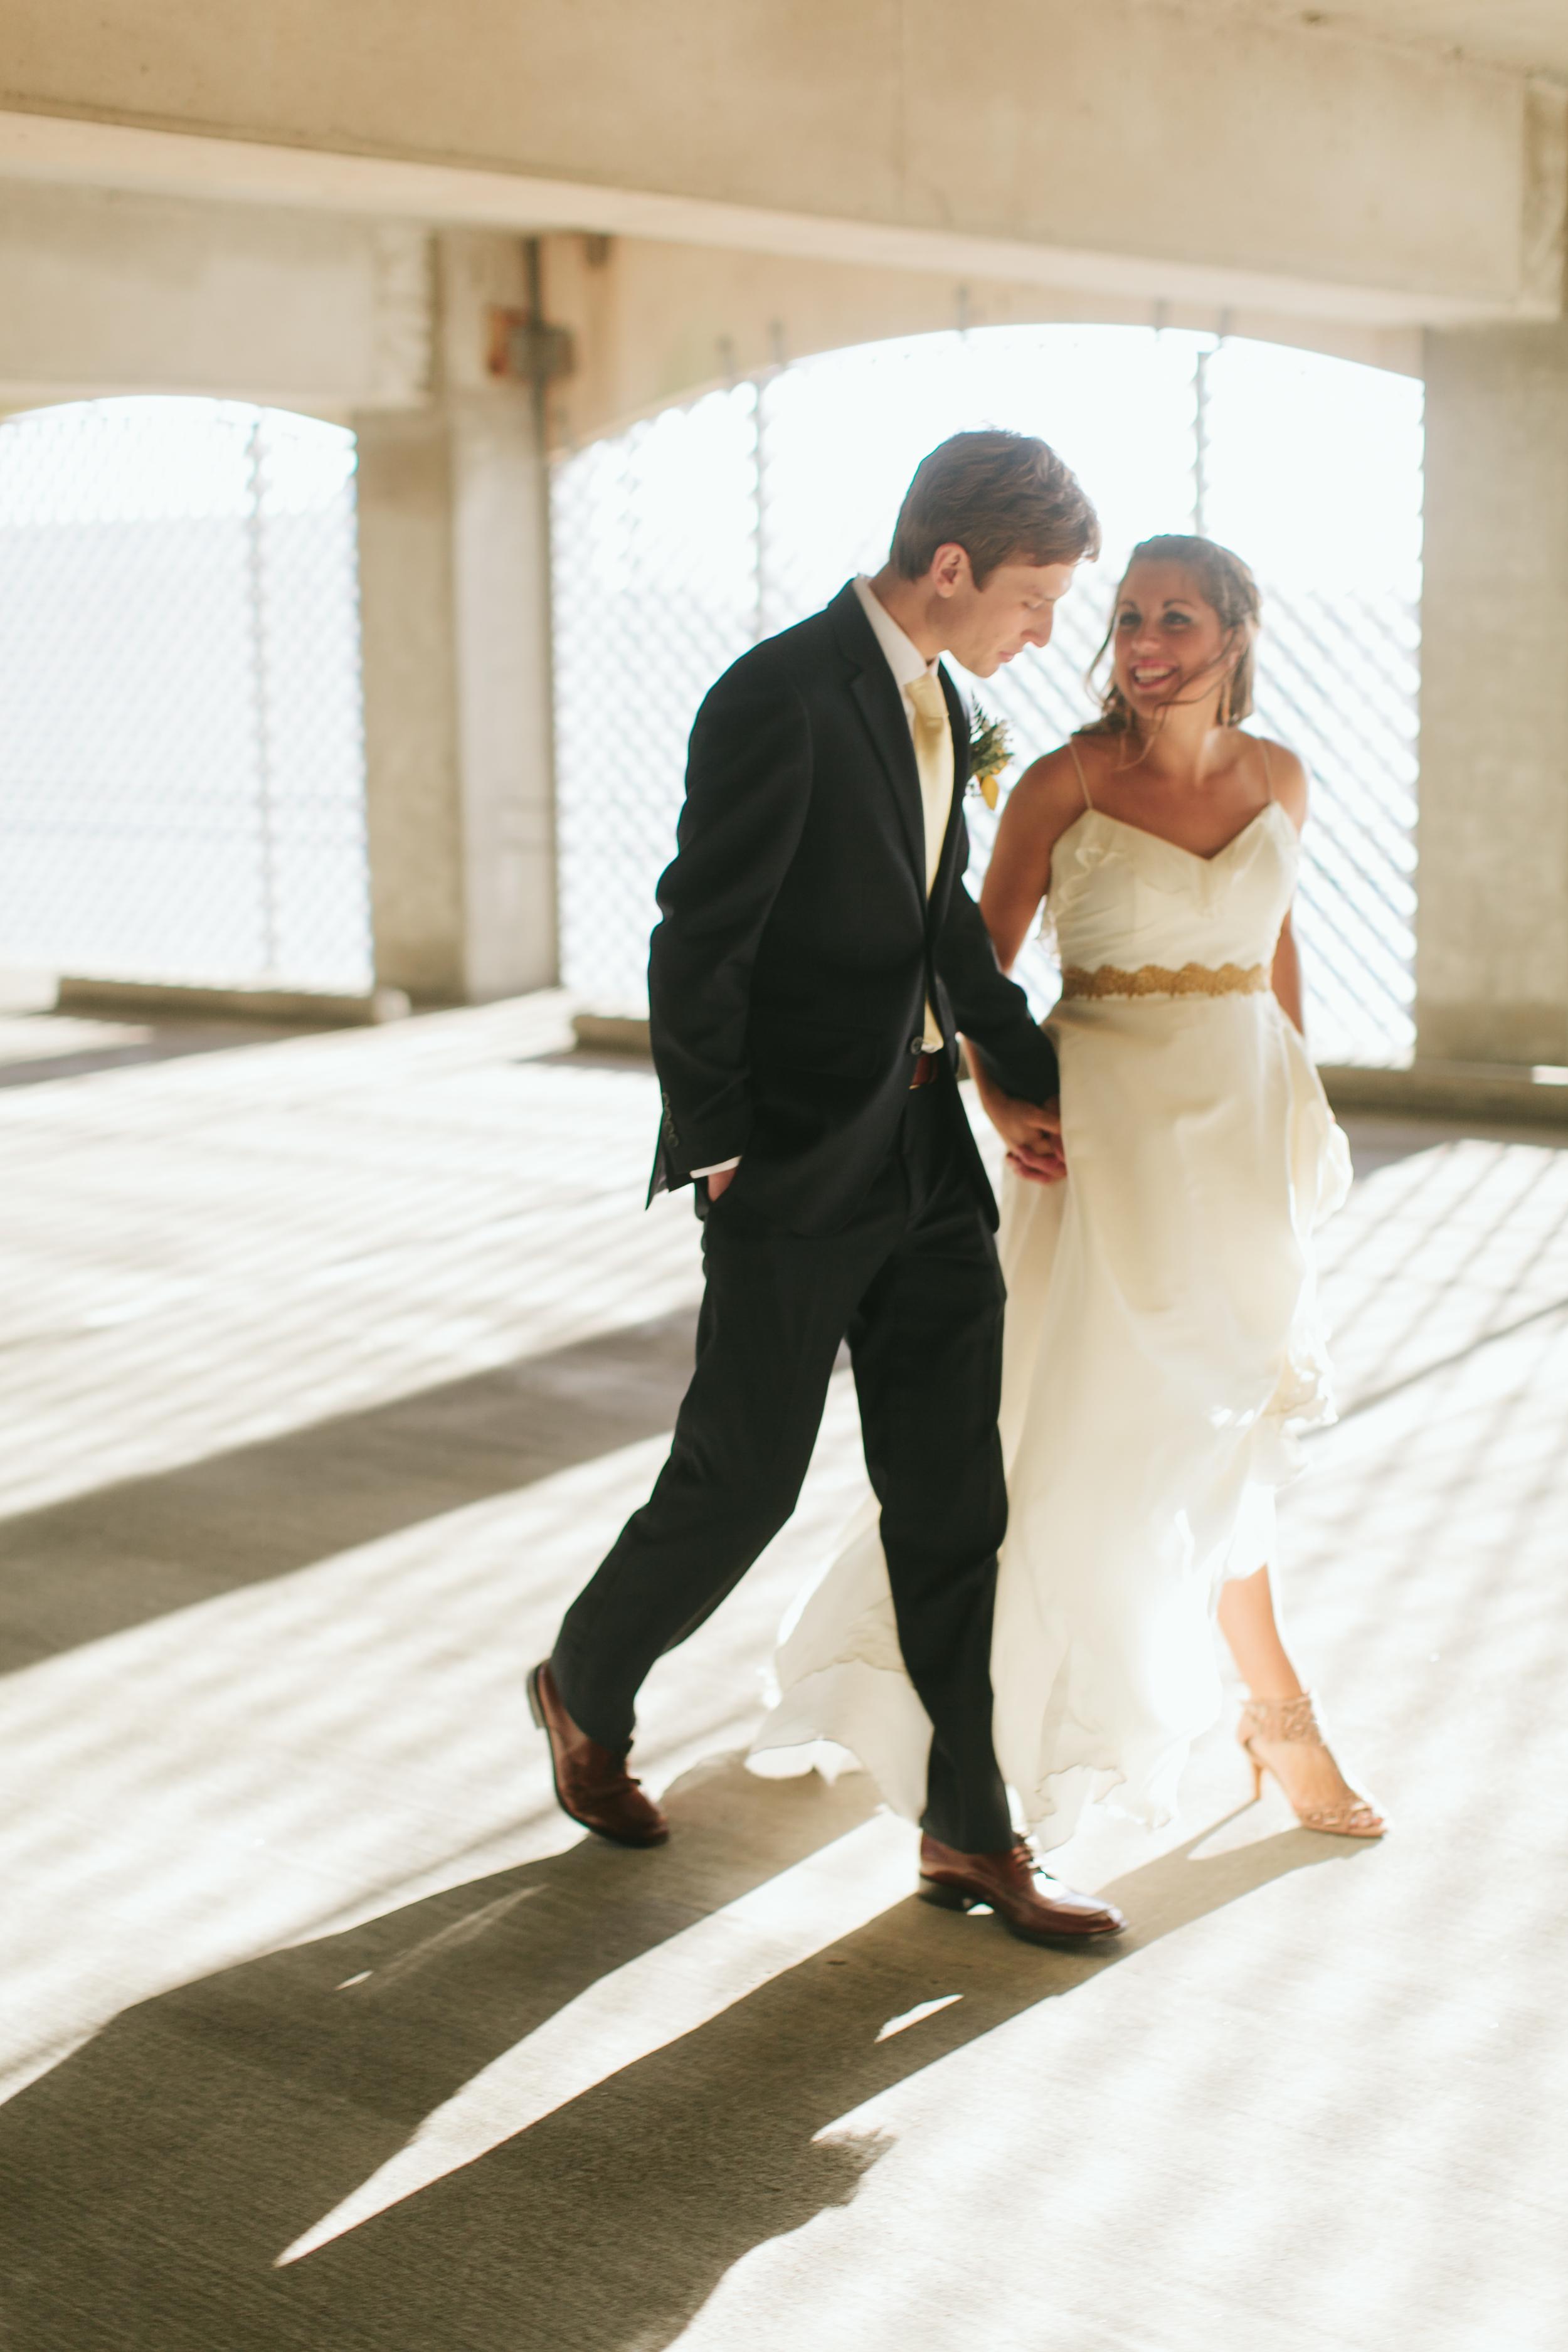 Kathryn-McCrary-Photography-Atlanta-Wedding-Photographer-58.jpg